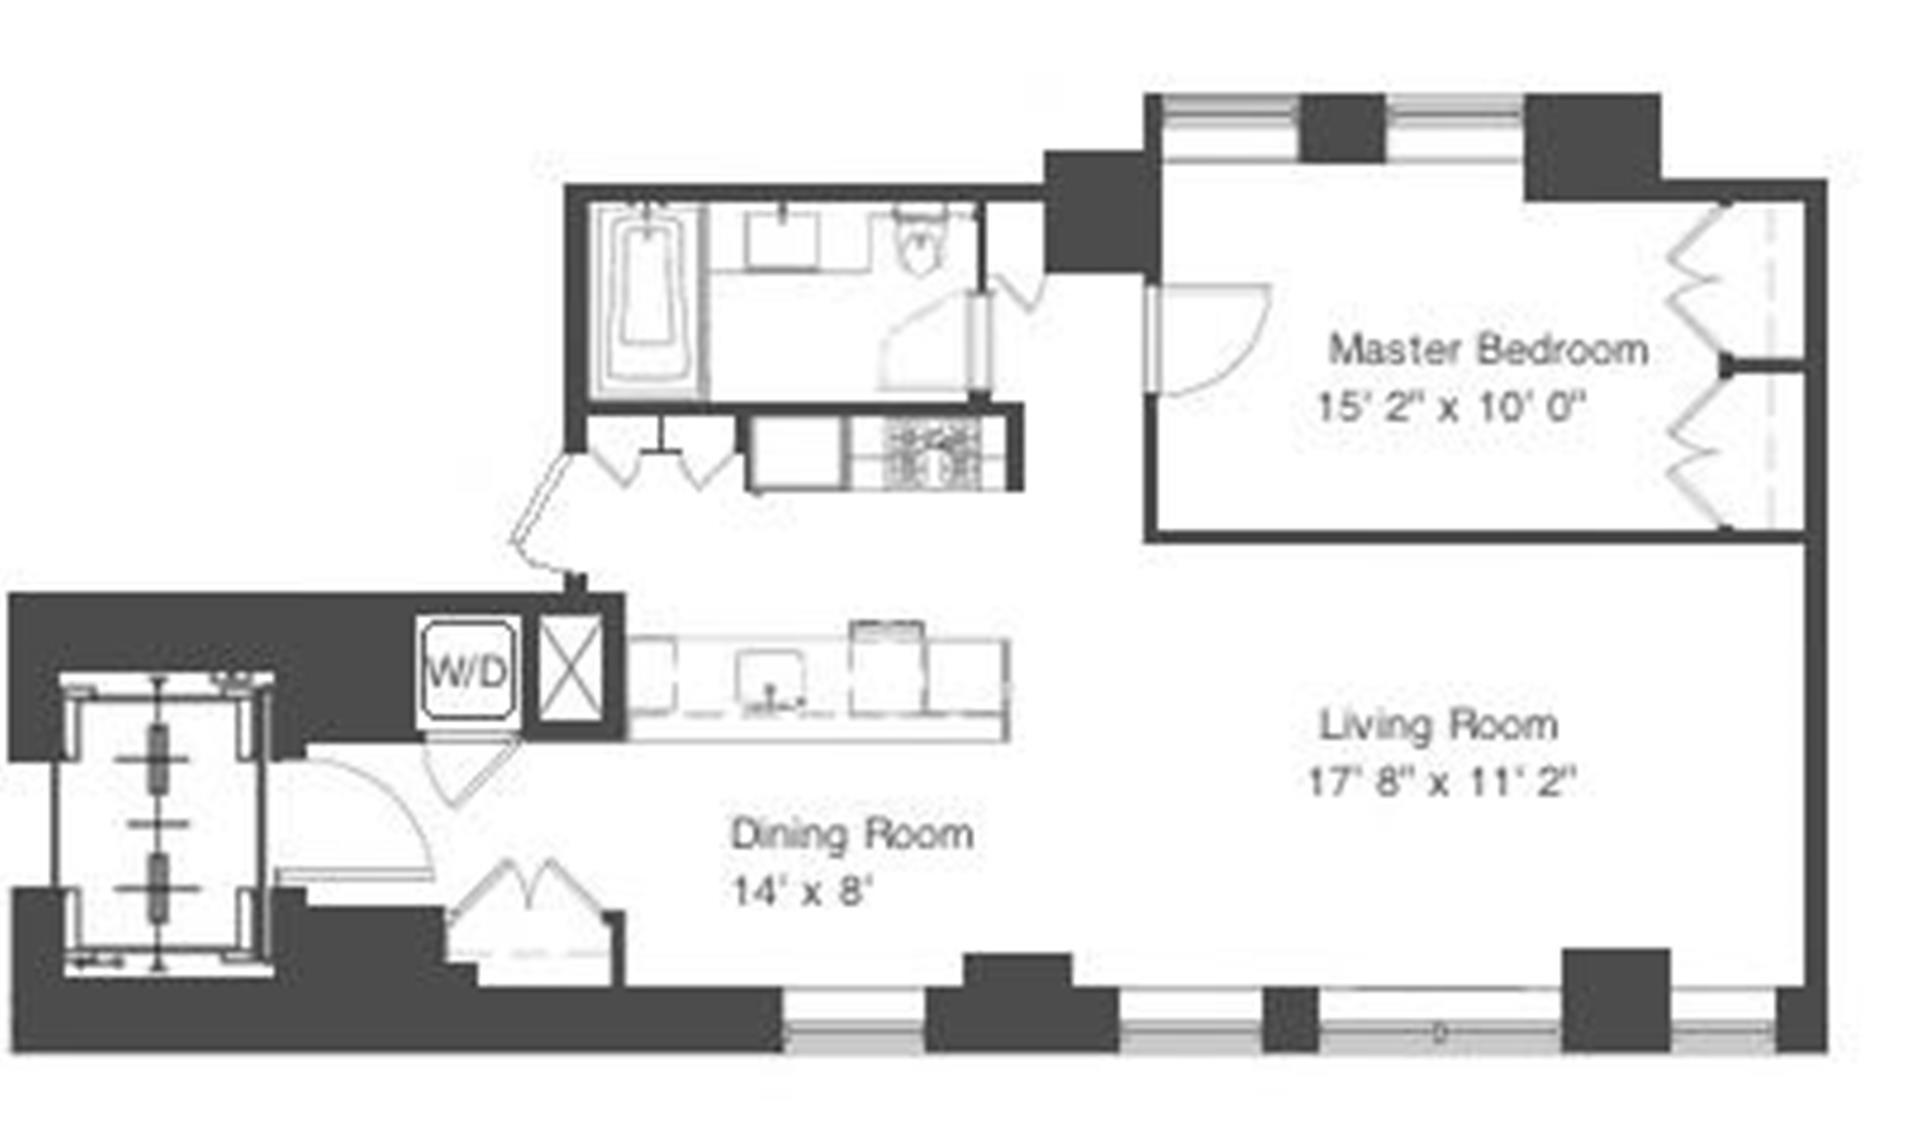 Floor plan of 260 Park Avenue South, 7K - Flatiron District, New York